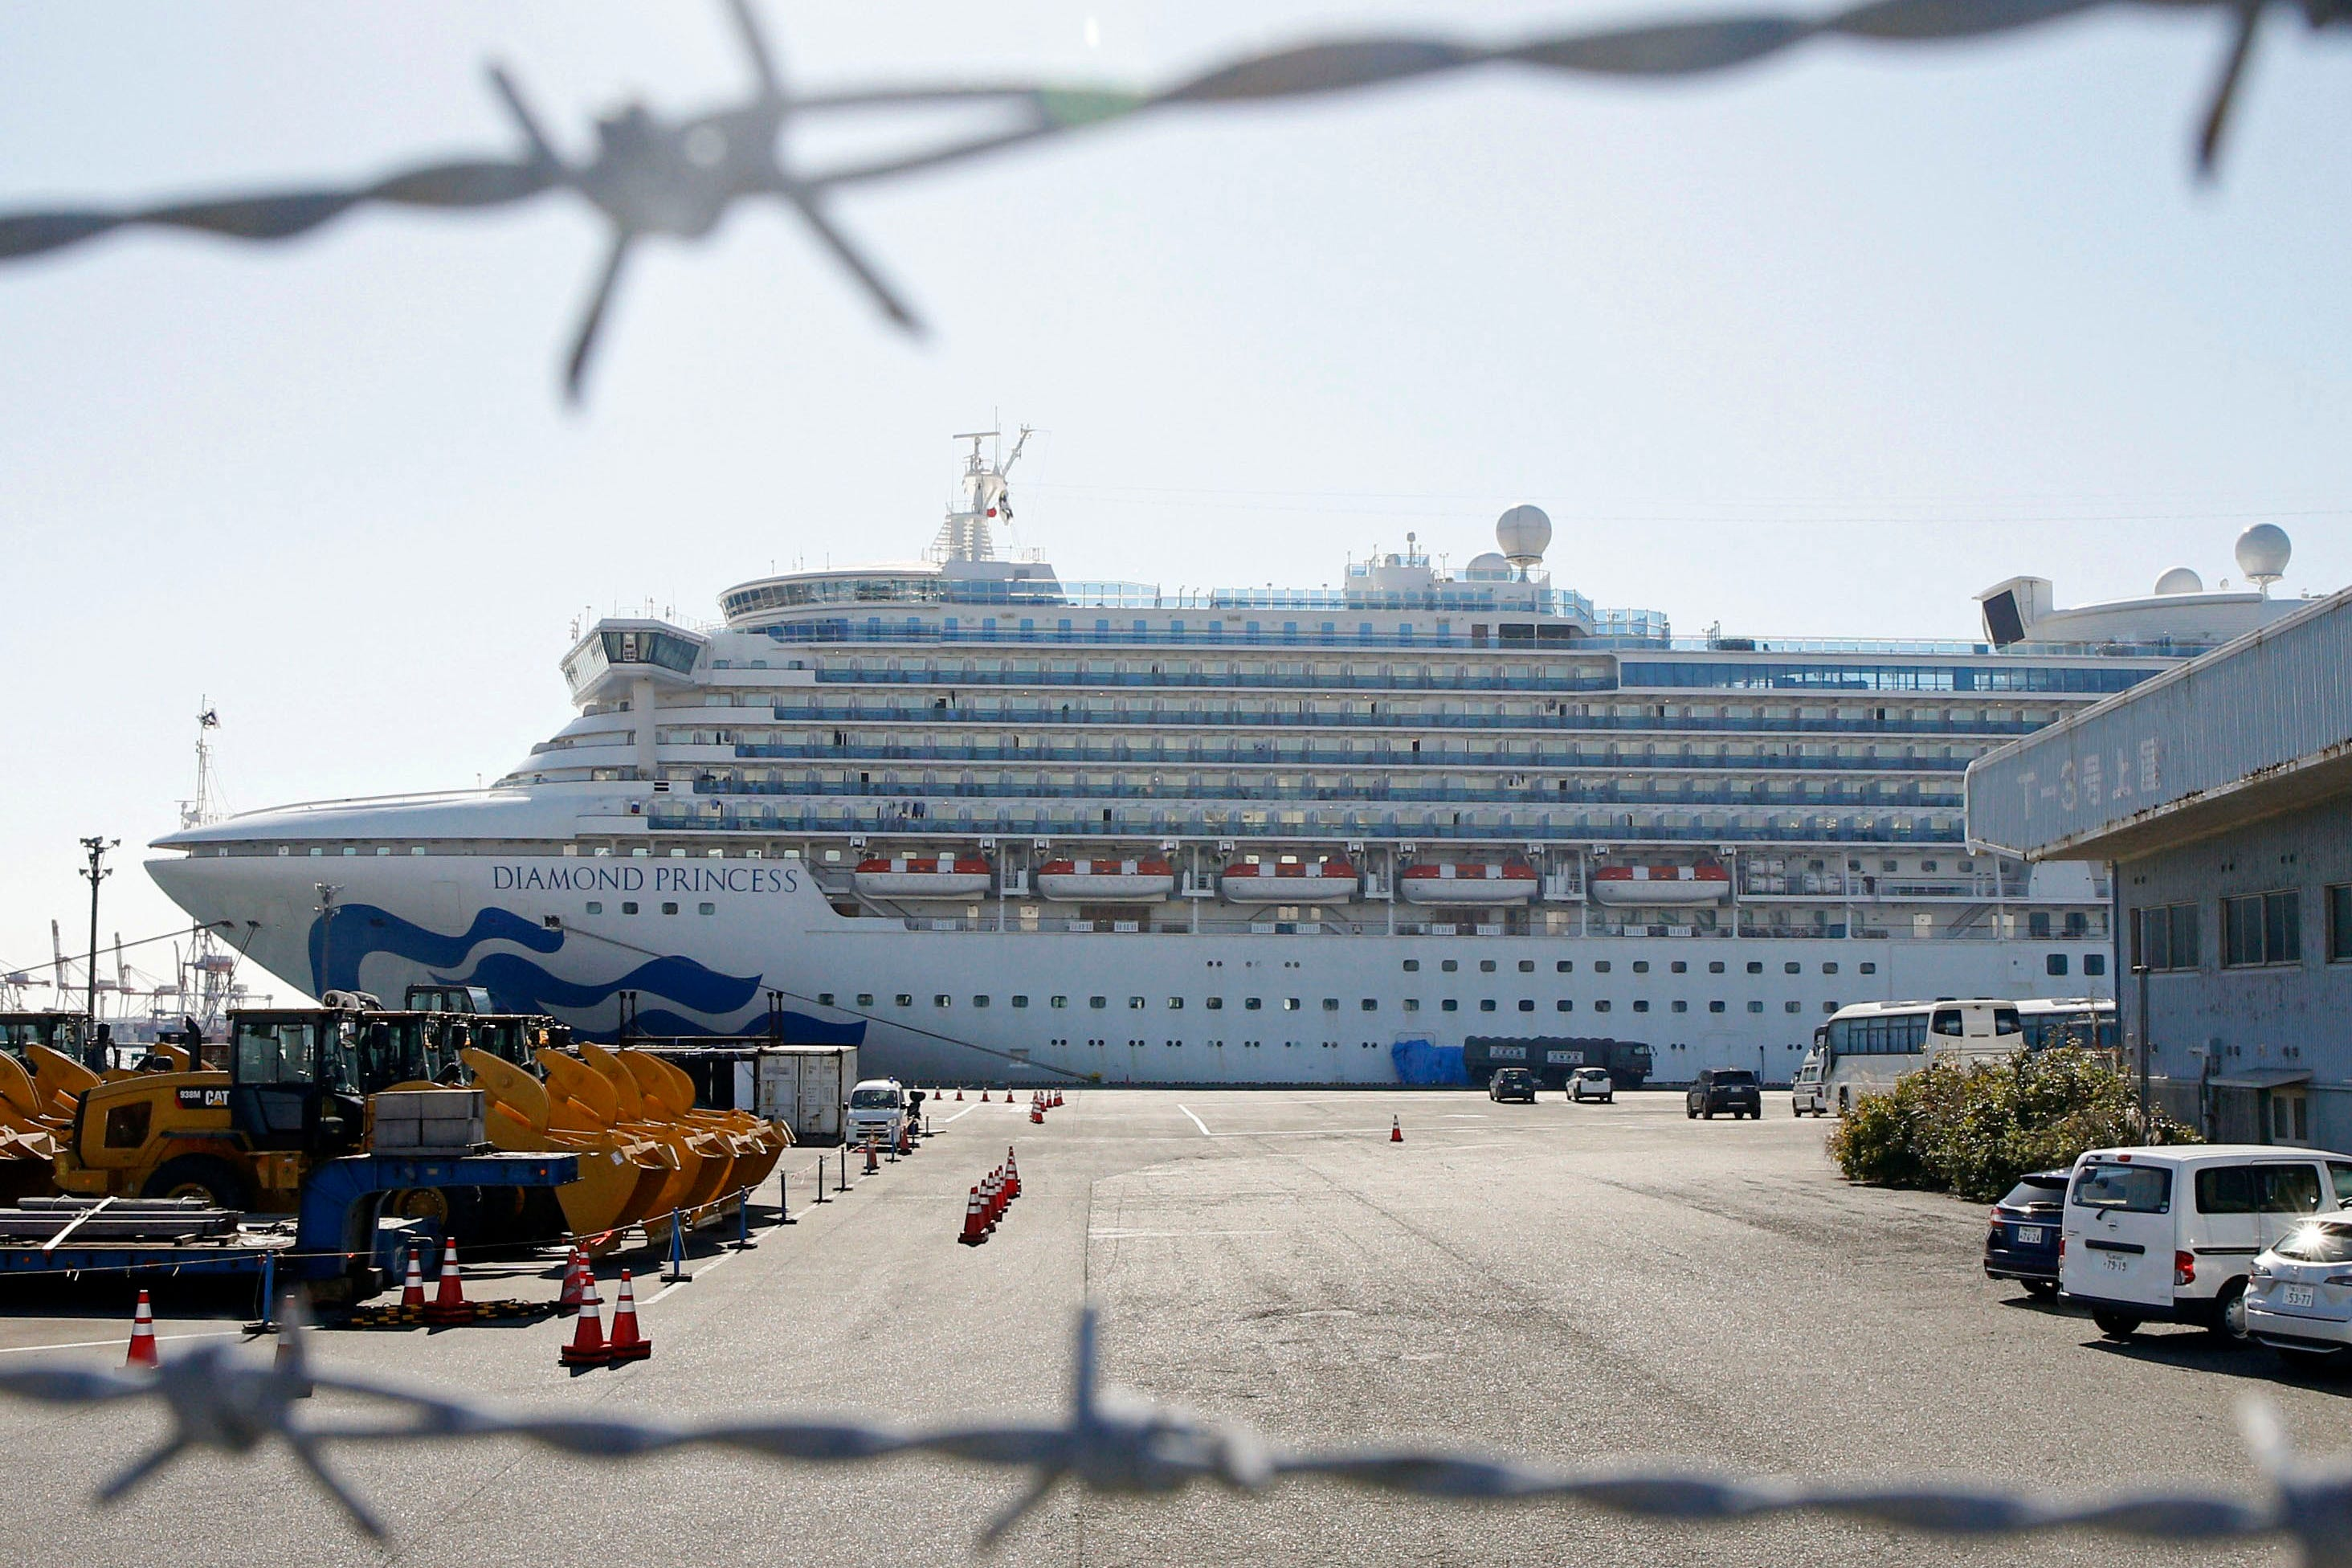 Two Diamond Princess cruise ship passengers die from coronavirus